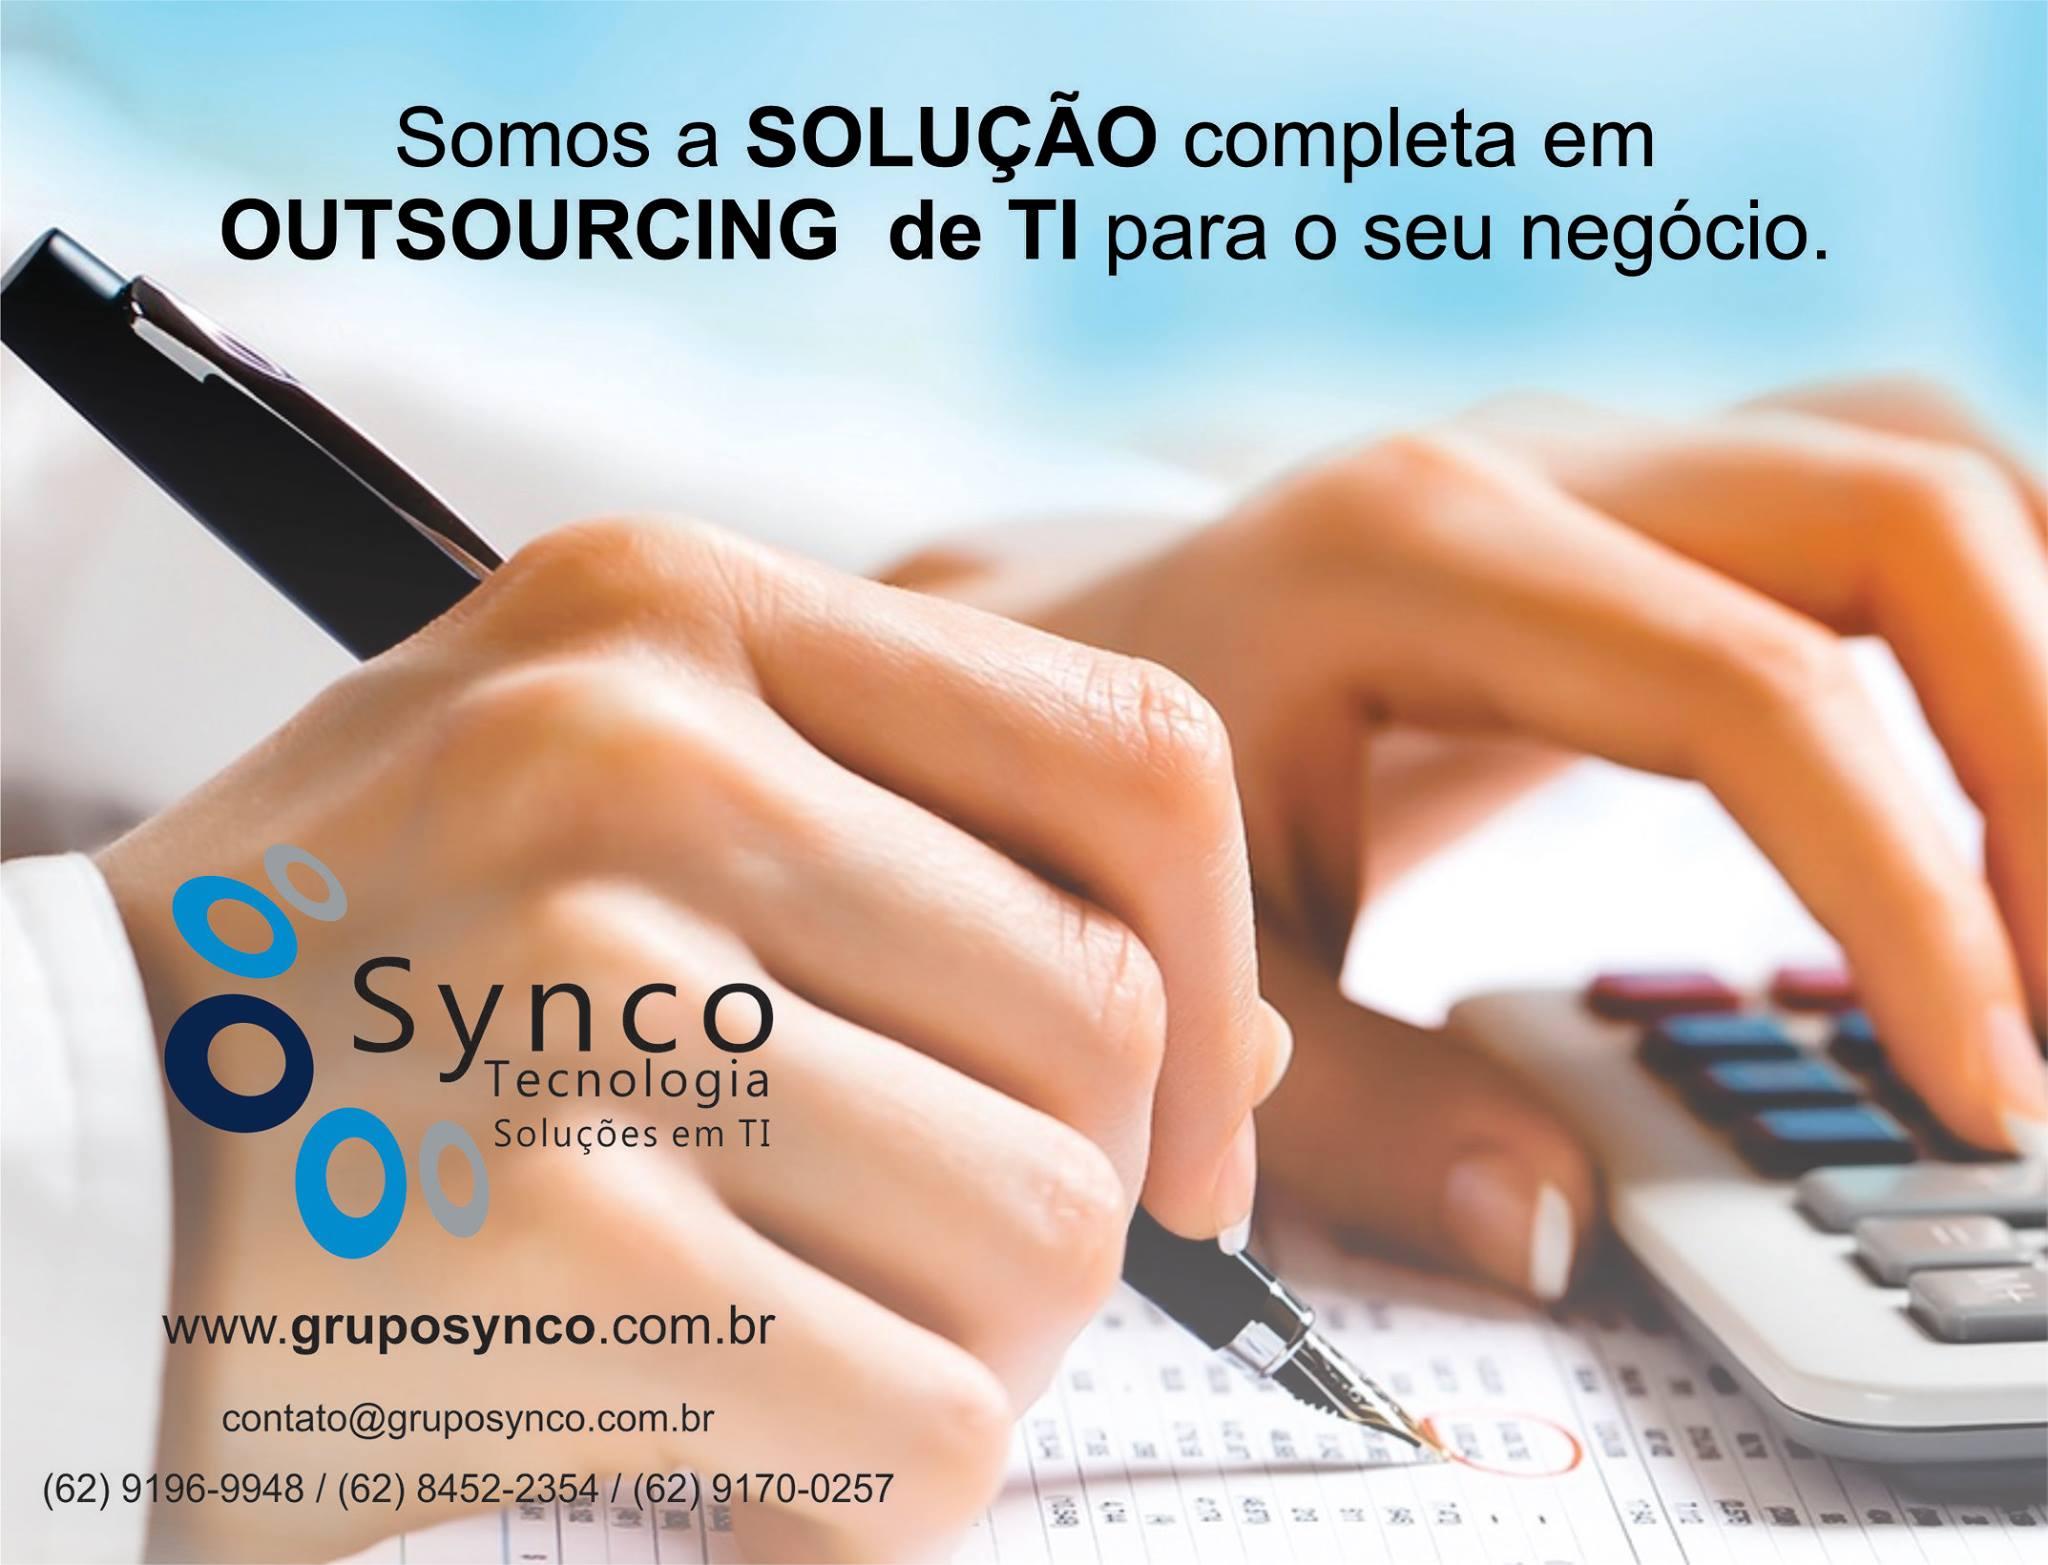 Grupo Synco Tecnologia